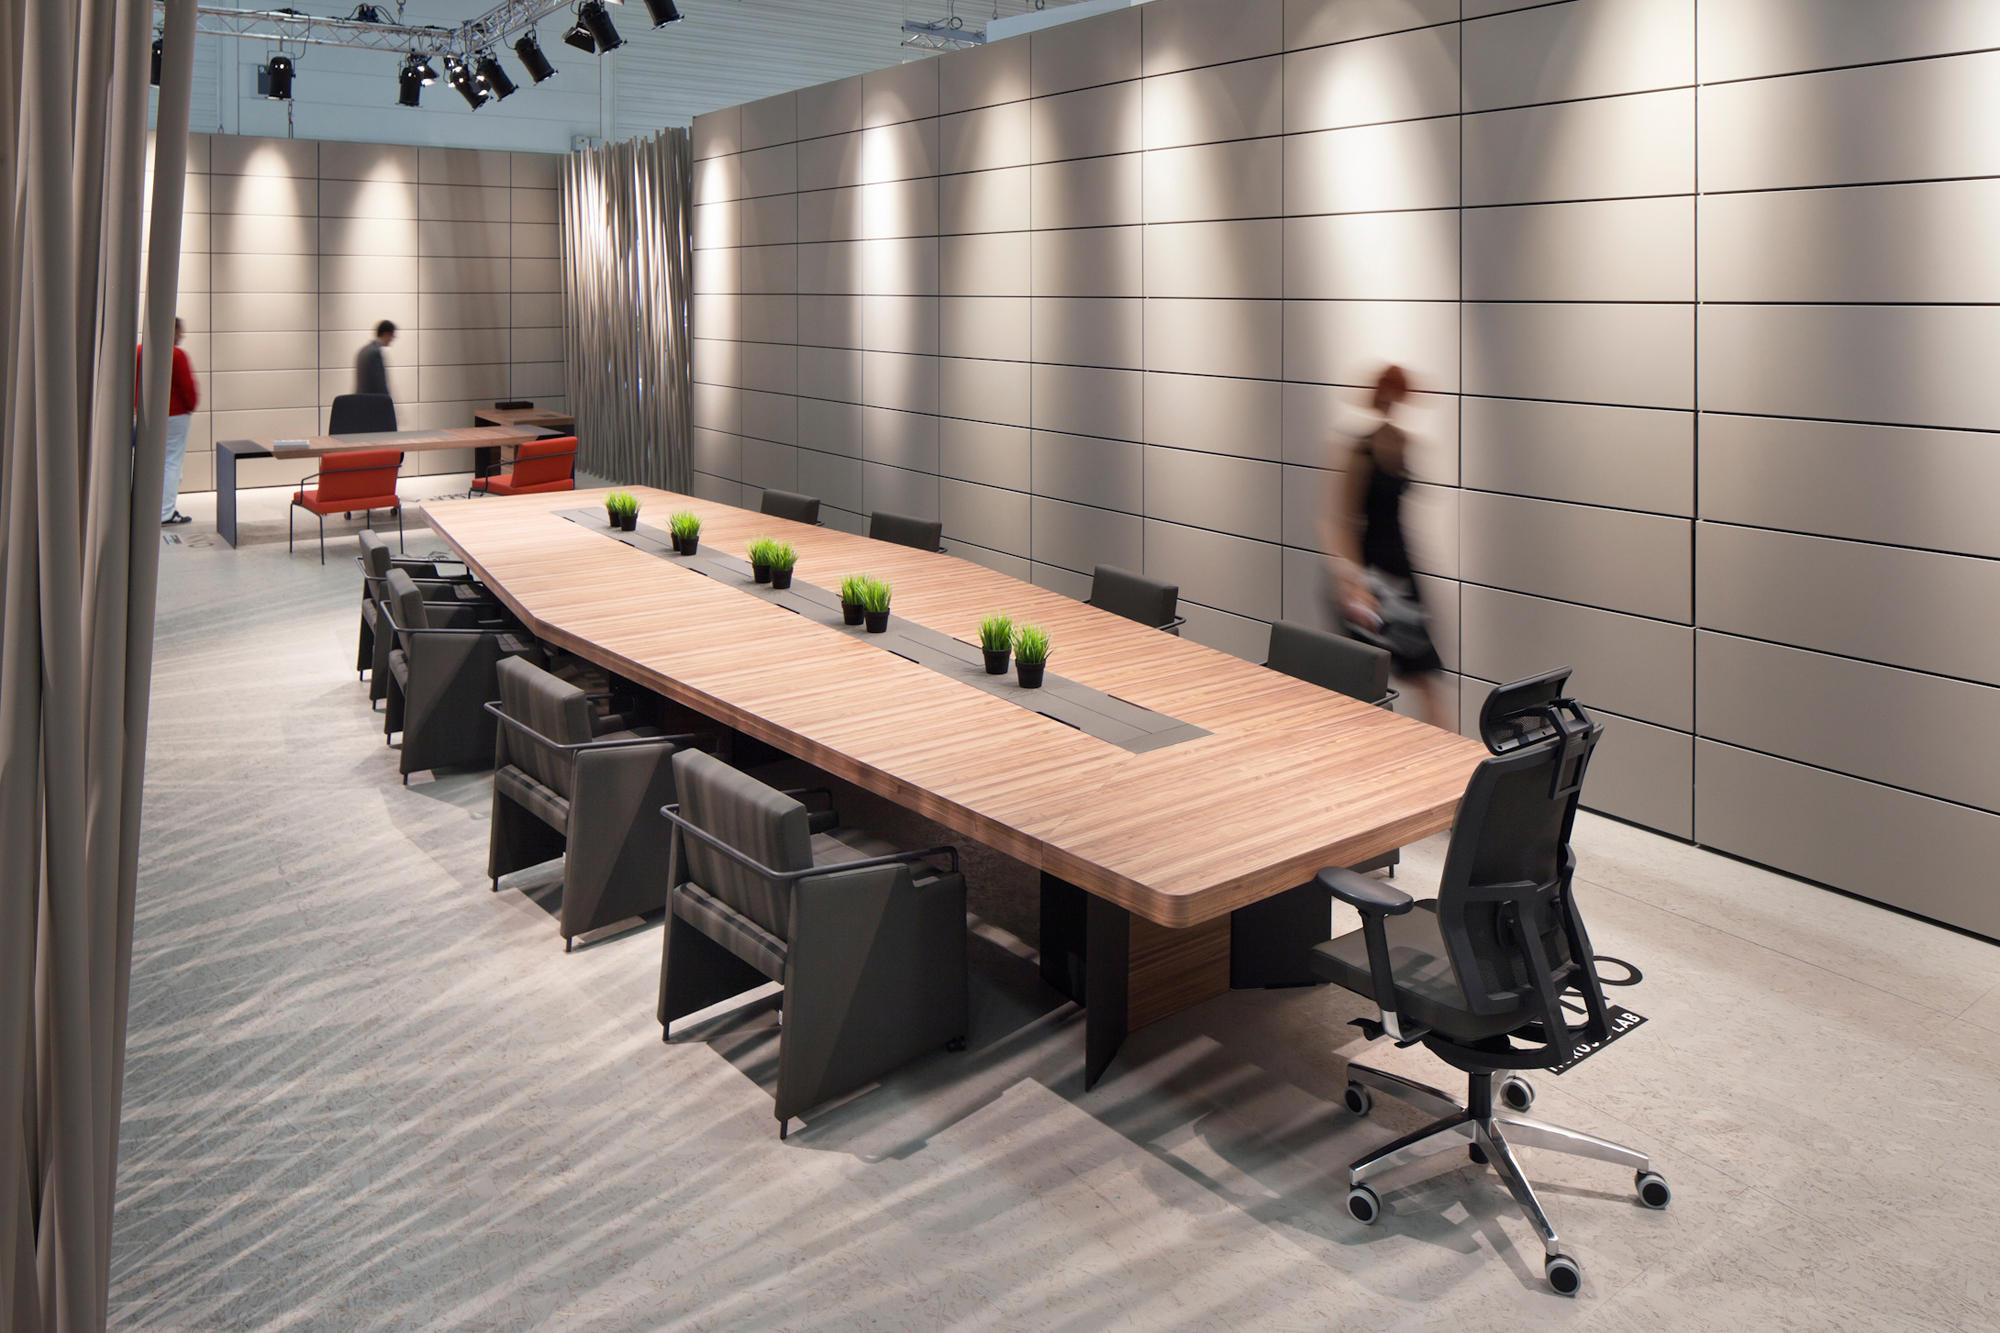 Inno Table Desks From Nurus Architonic